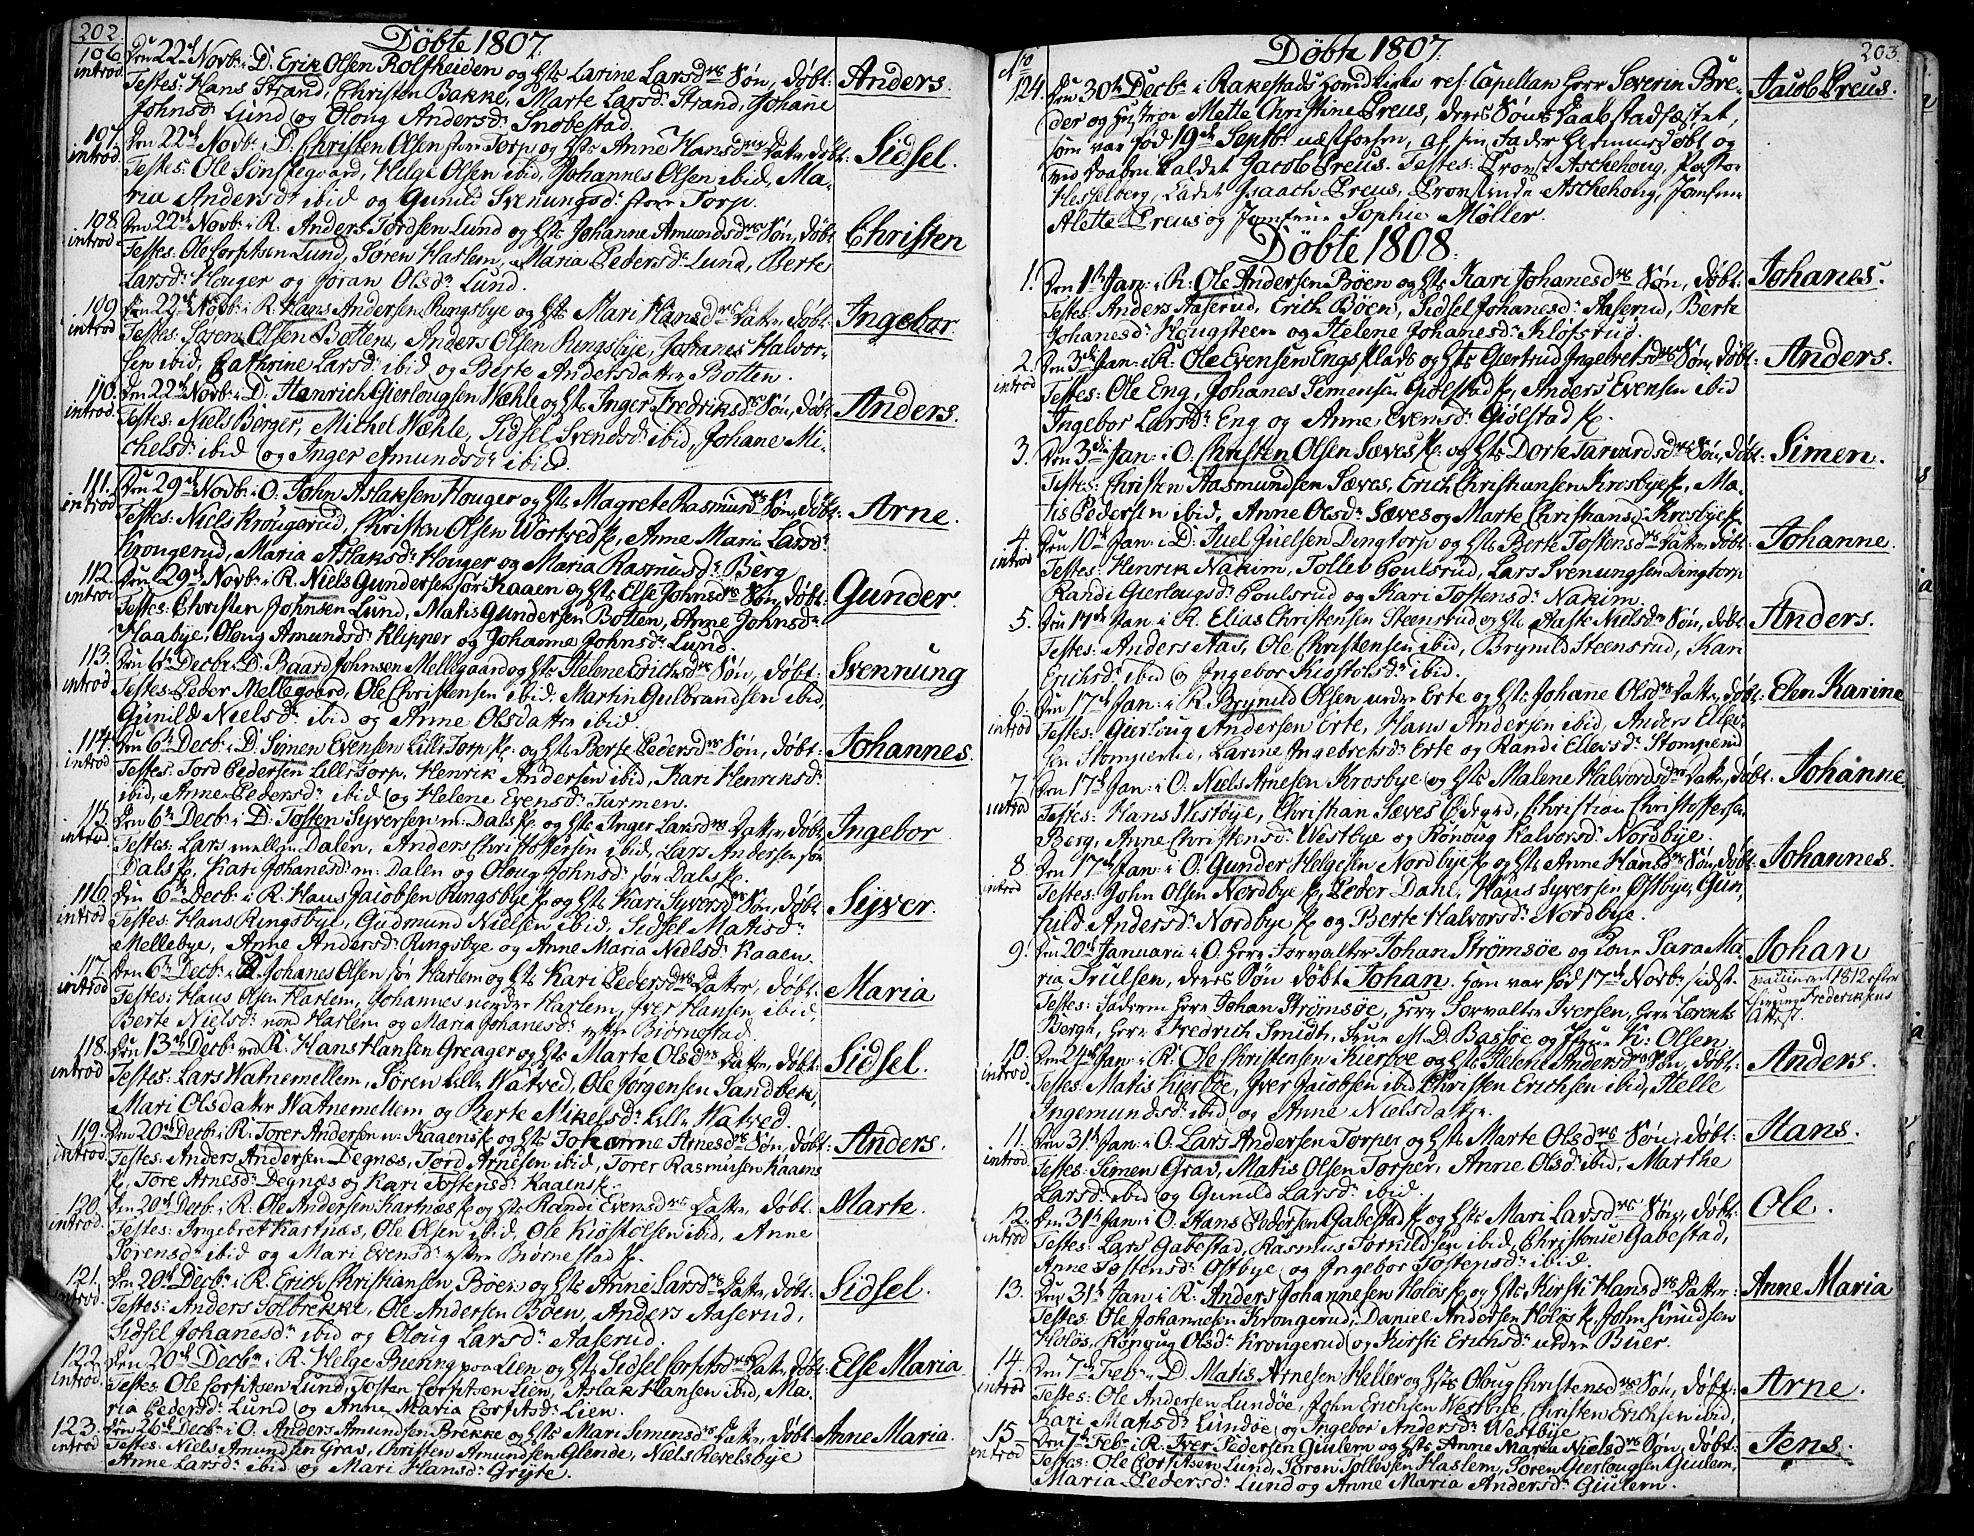 SAO, Rakkestad prestekontor Kirkebøker, F/Fa/L0005: Ministerialbok nr. I 5, 1784-1814, s. 202-203